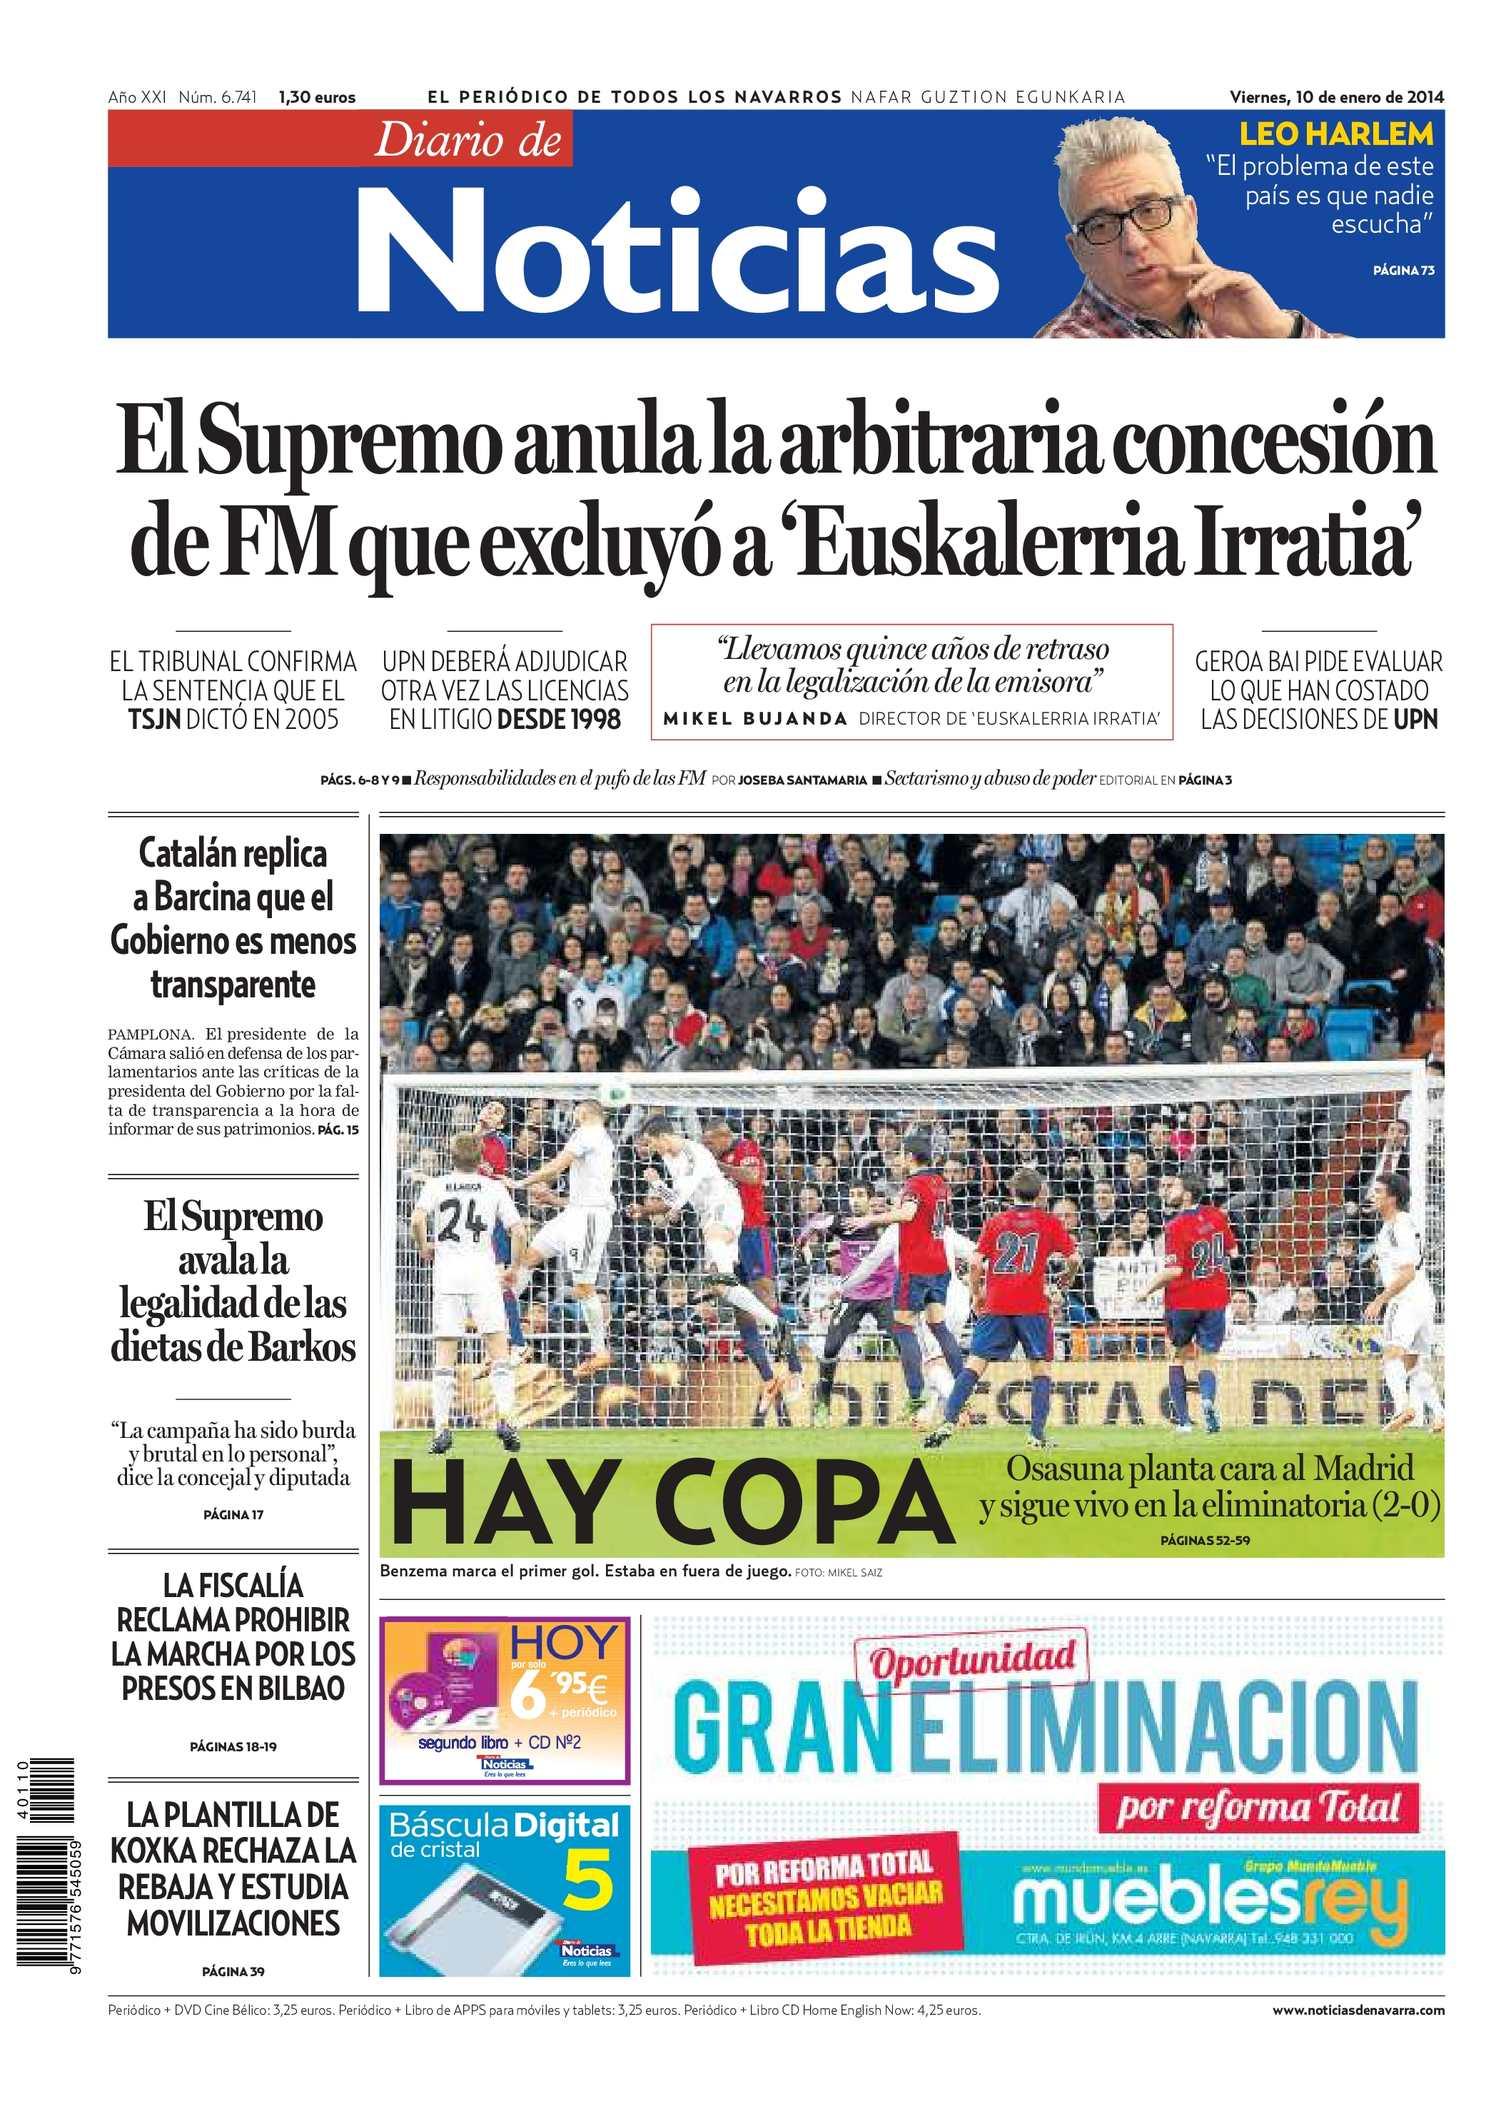 Calaméo - Diario de Noticias 20140110 593c262c10620